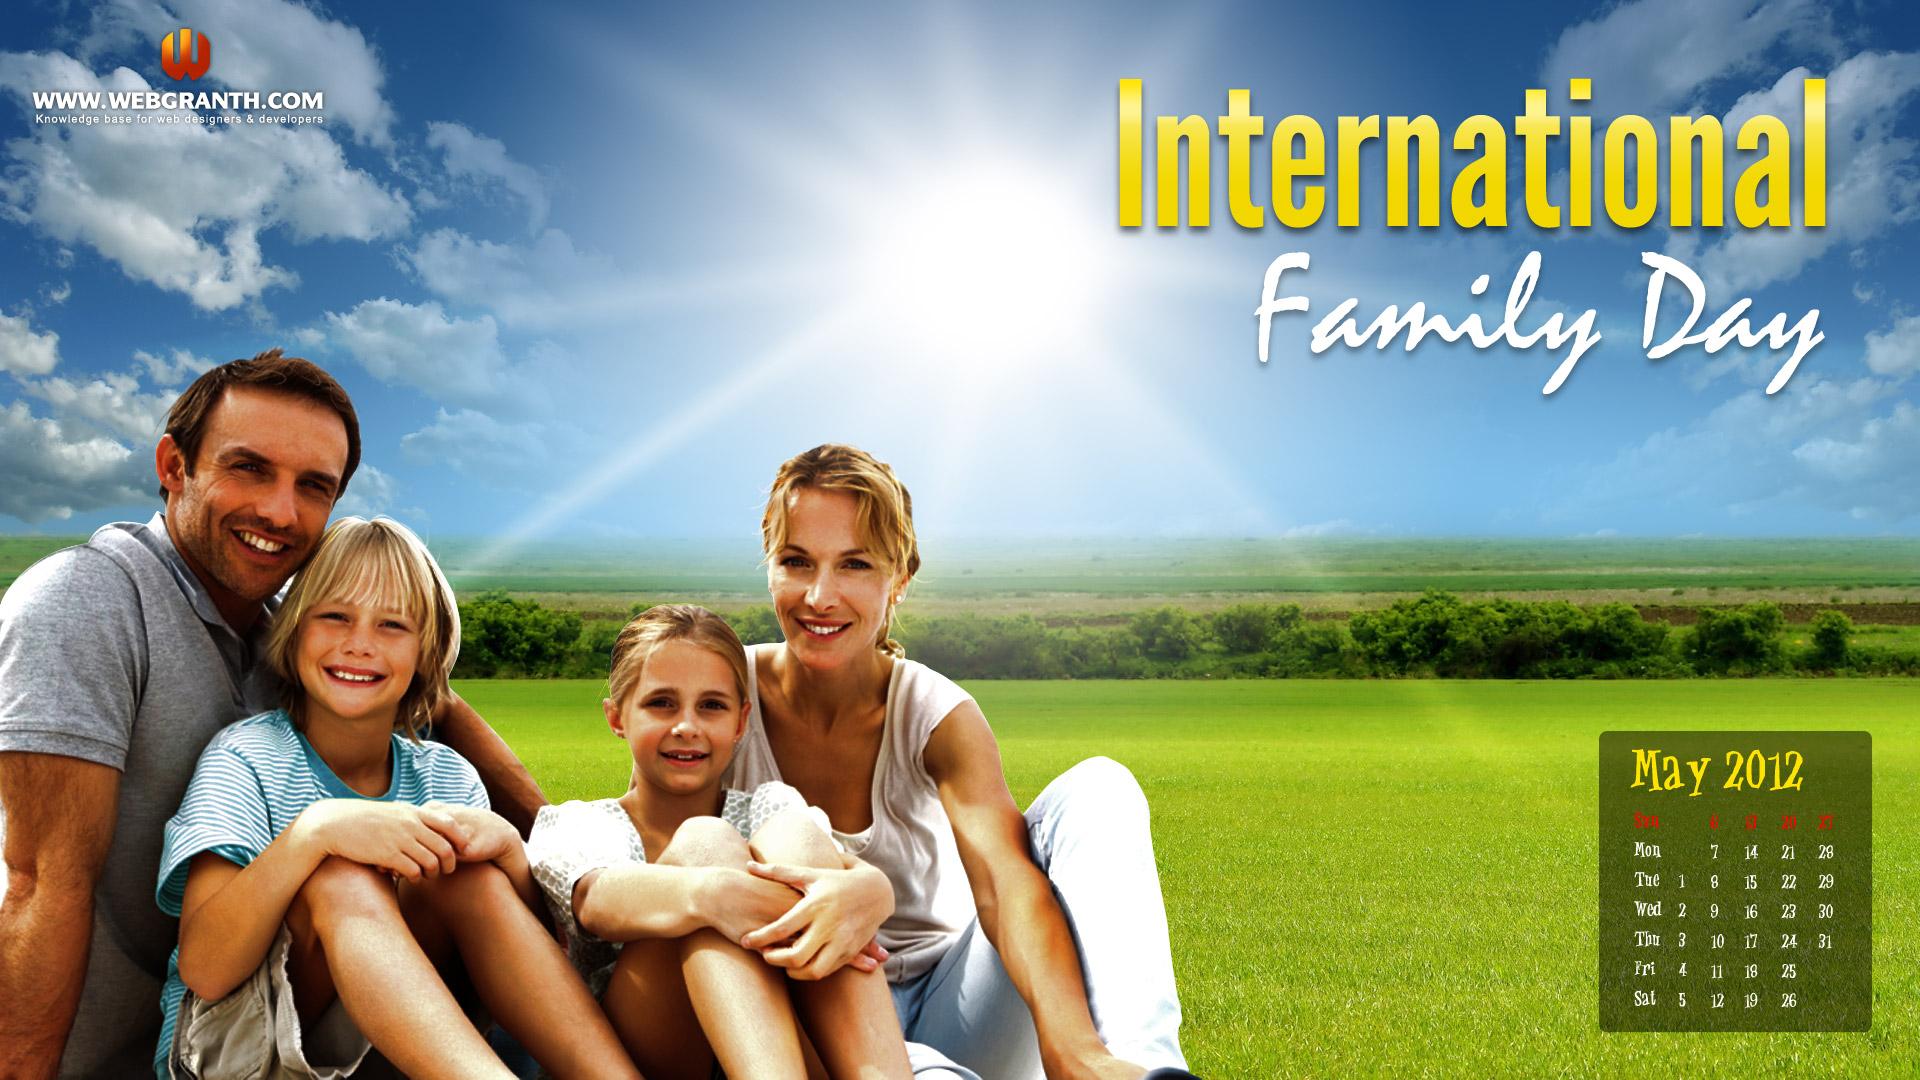 Desktop International Family Day Wallpaper   Webgranth 2015 1920x1080